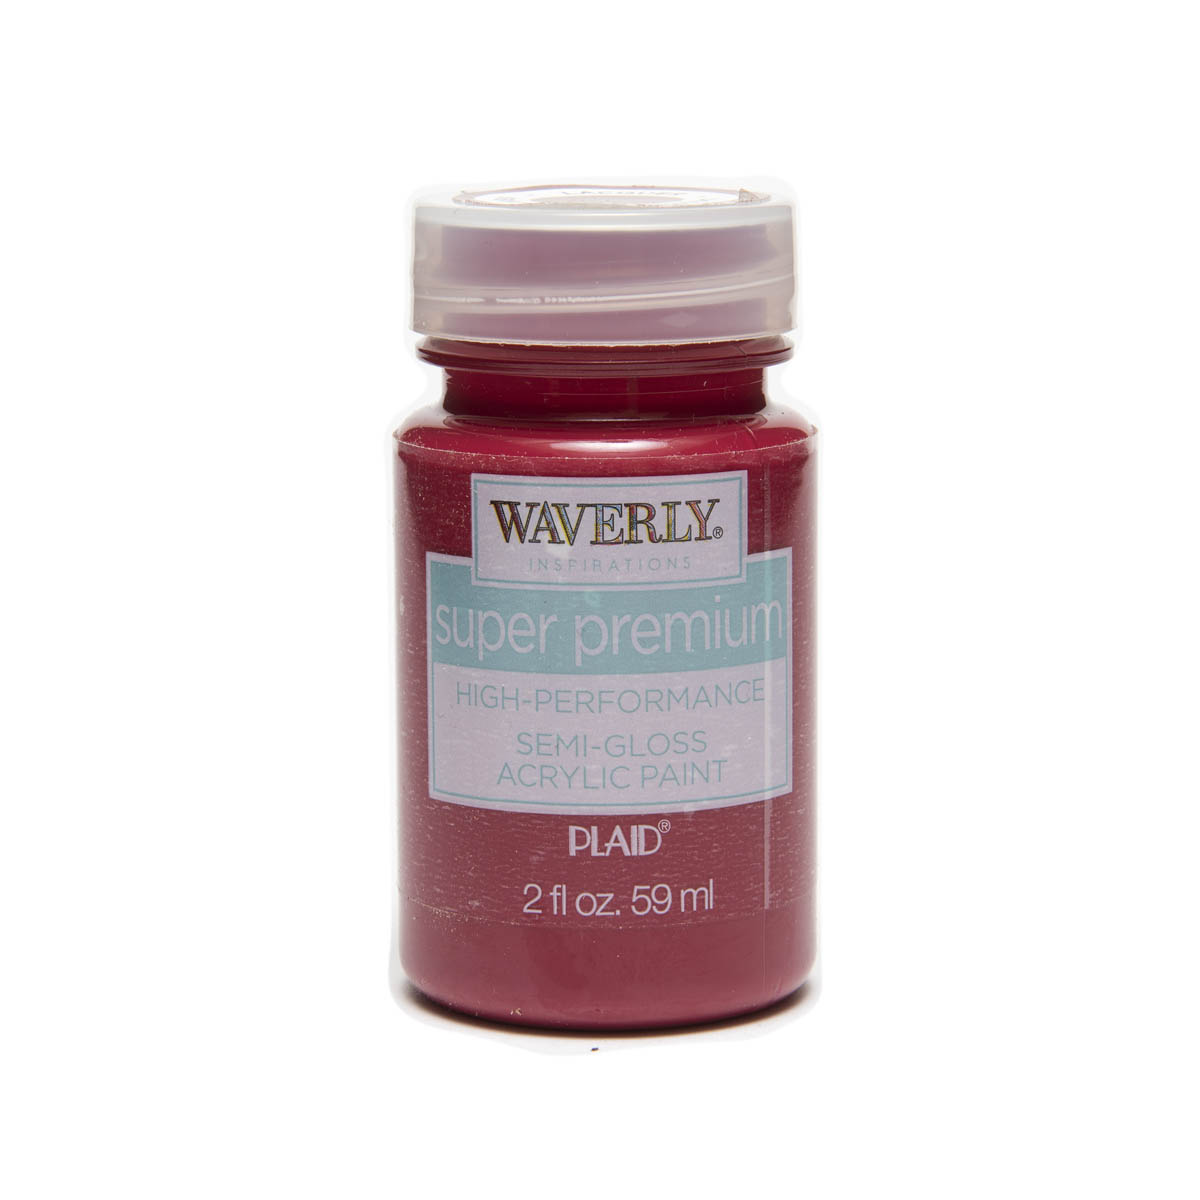 Waverly ® Inspirations Super Premium Semi-Gloss Acrylic Paint - Lacquer, 2 oz.